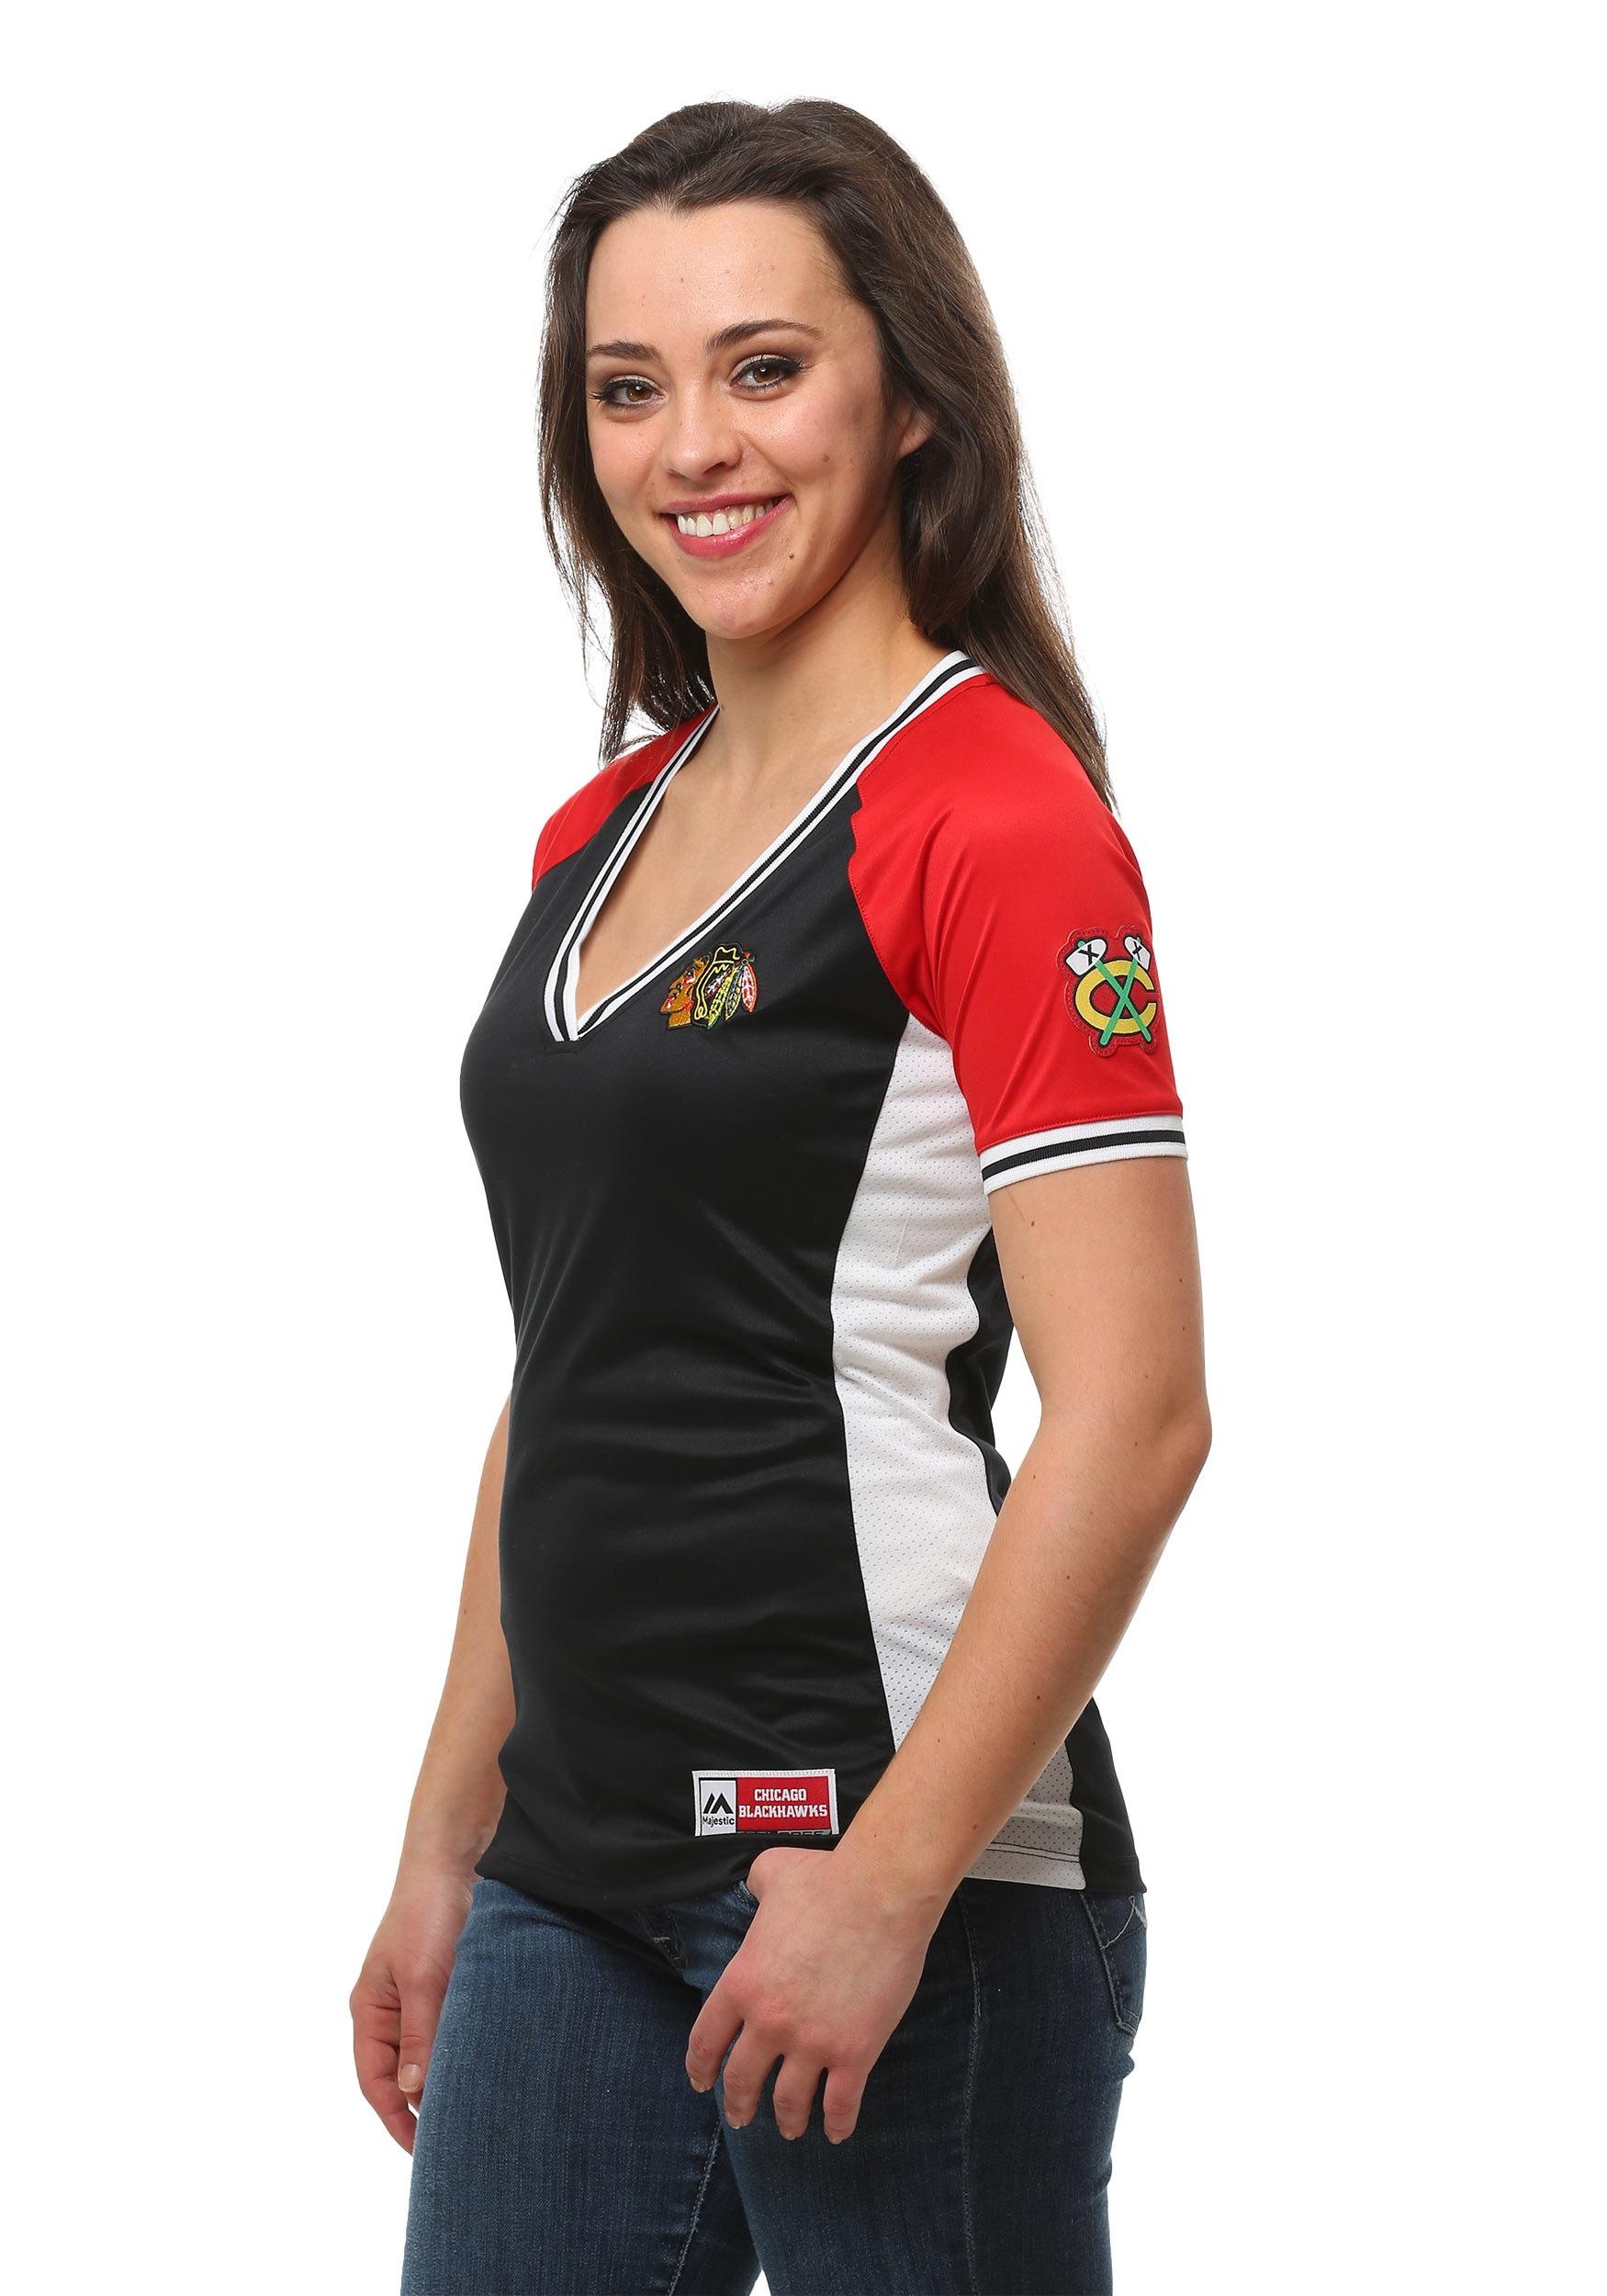 Chicago Blackhawks League Diva Women 39 S T Shirt